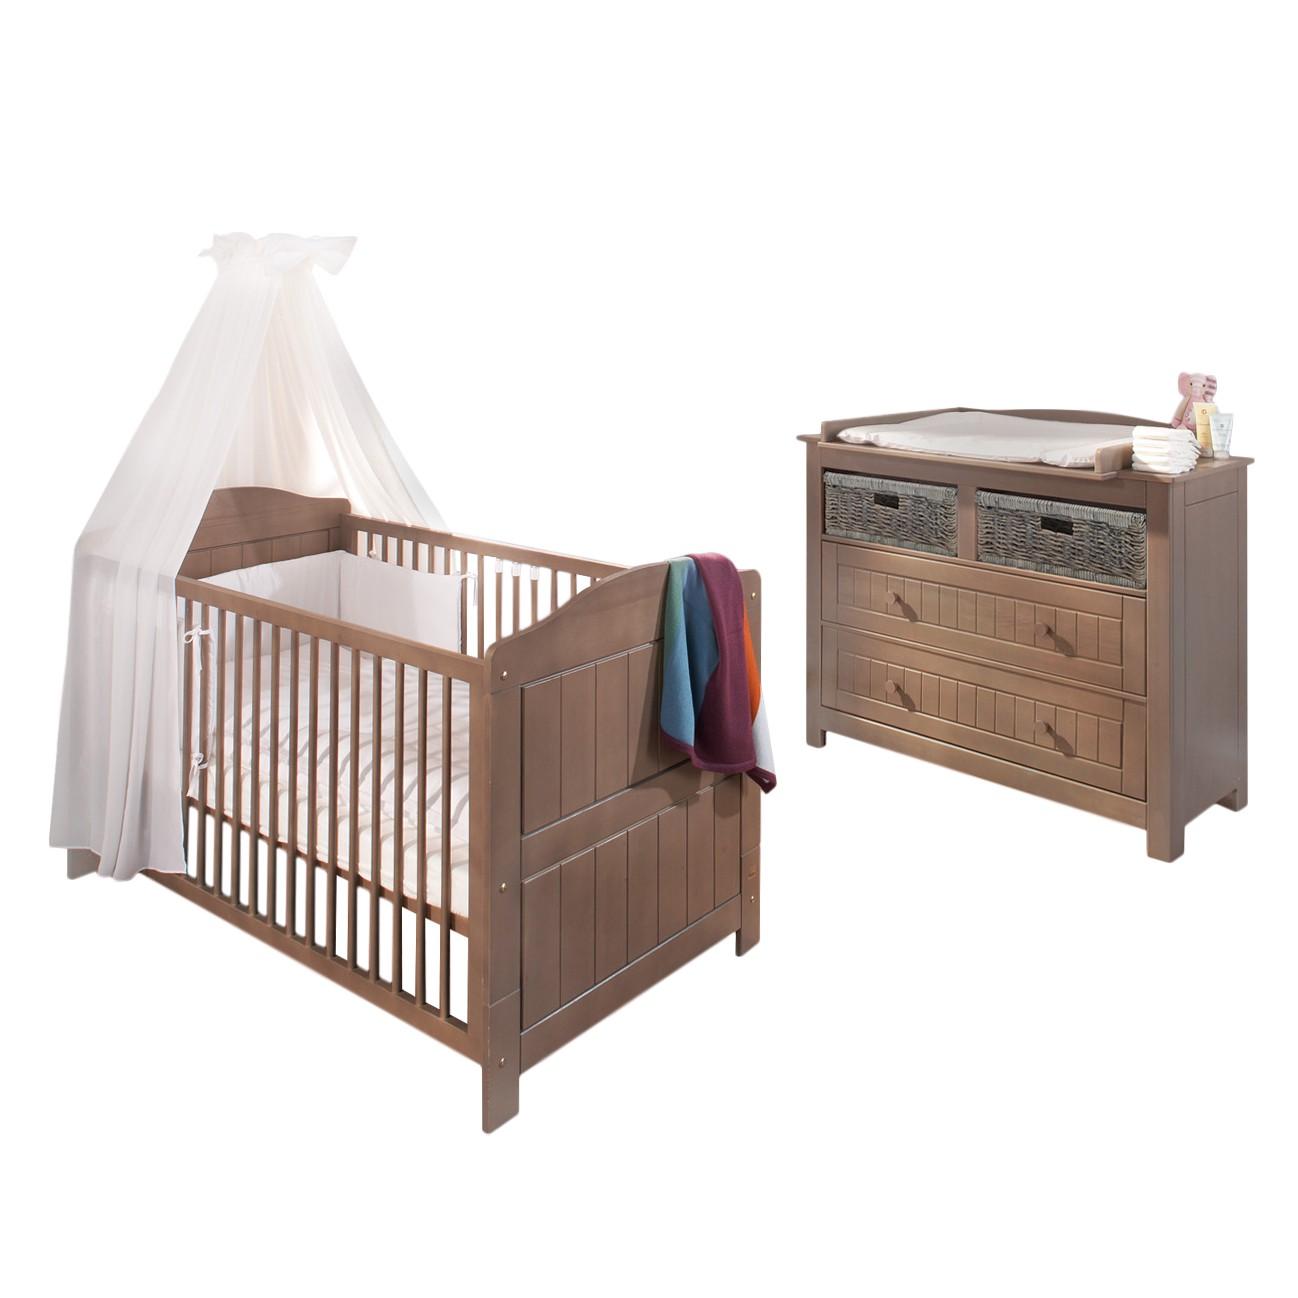 sparset jelka 2 teilig babybett und wickelkommode. Black Bedroom Furniture Sets. Home Design Ideas